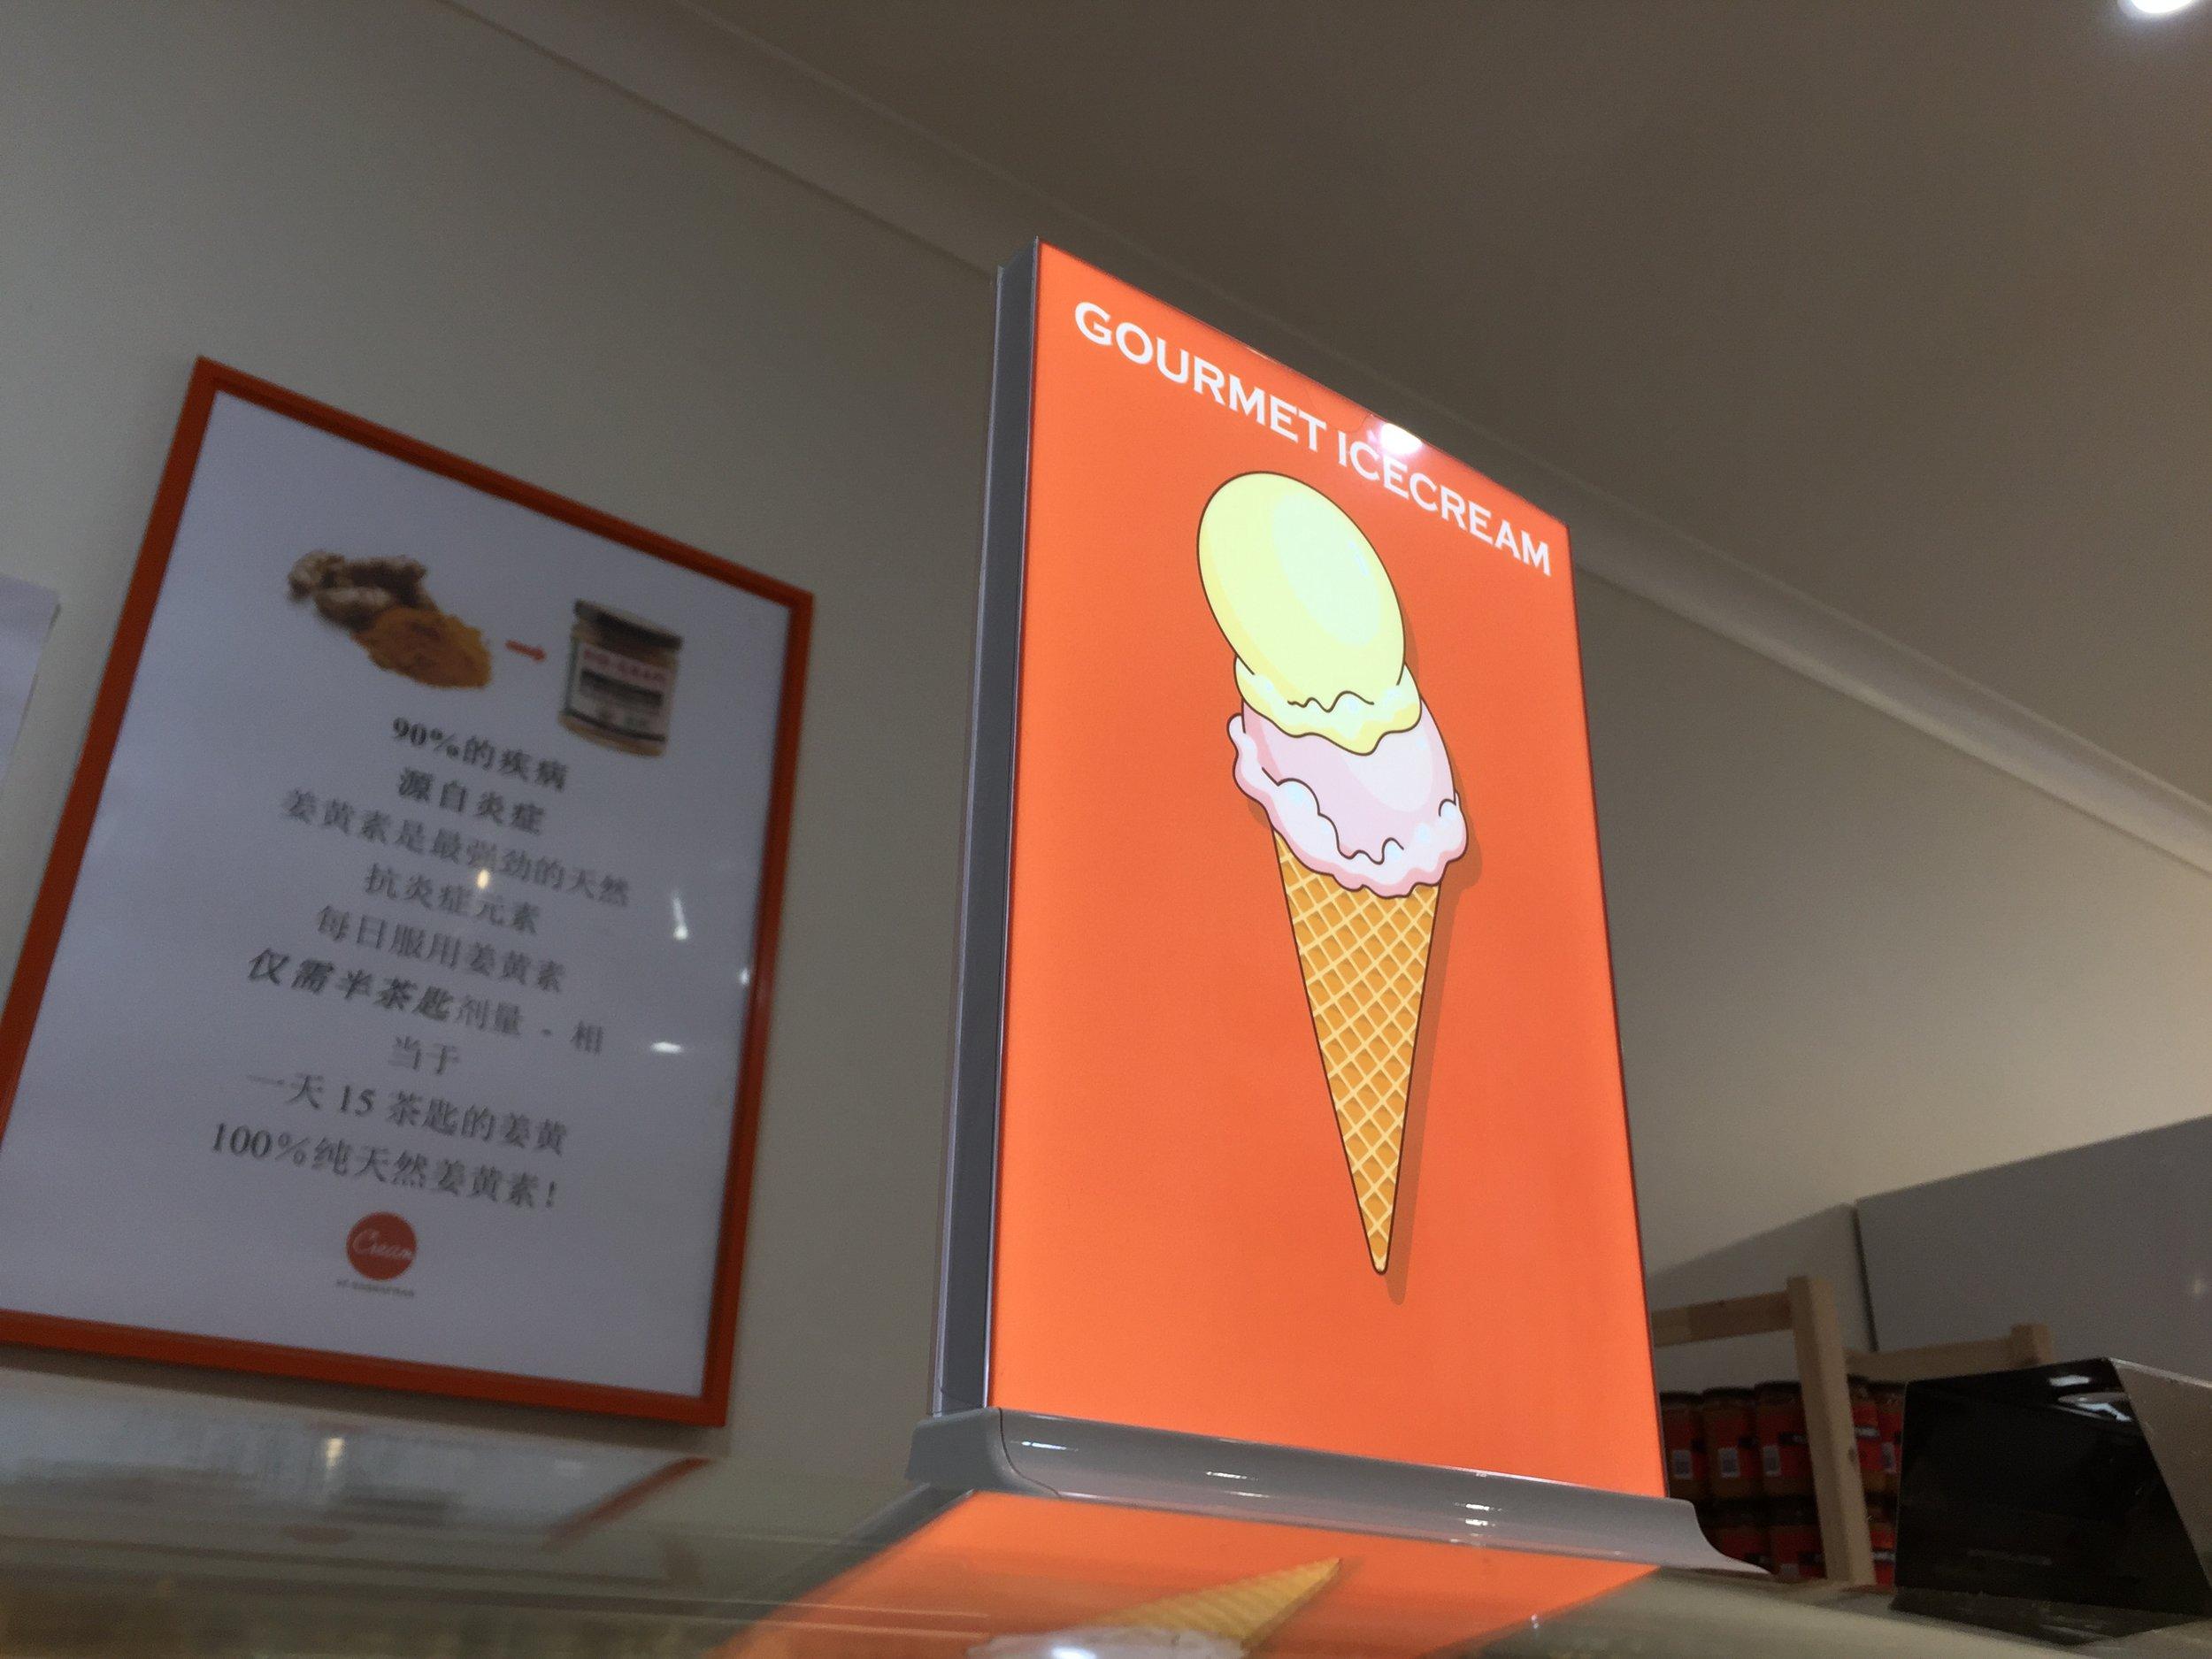 Glowpro at Cream At Sassafras